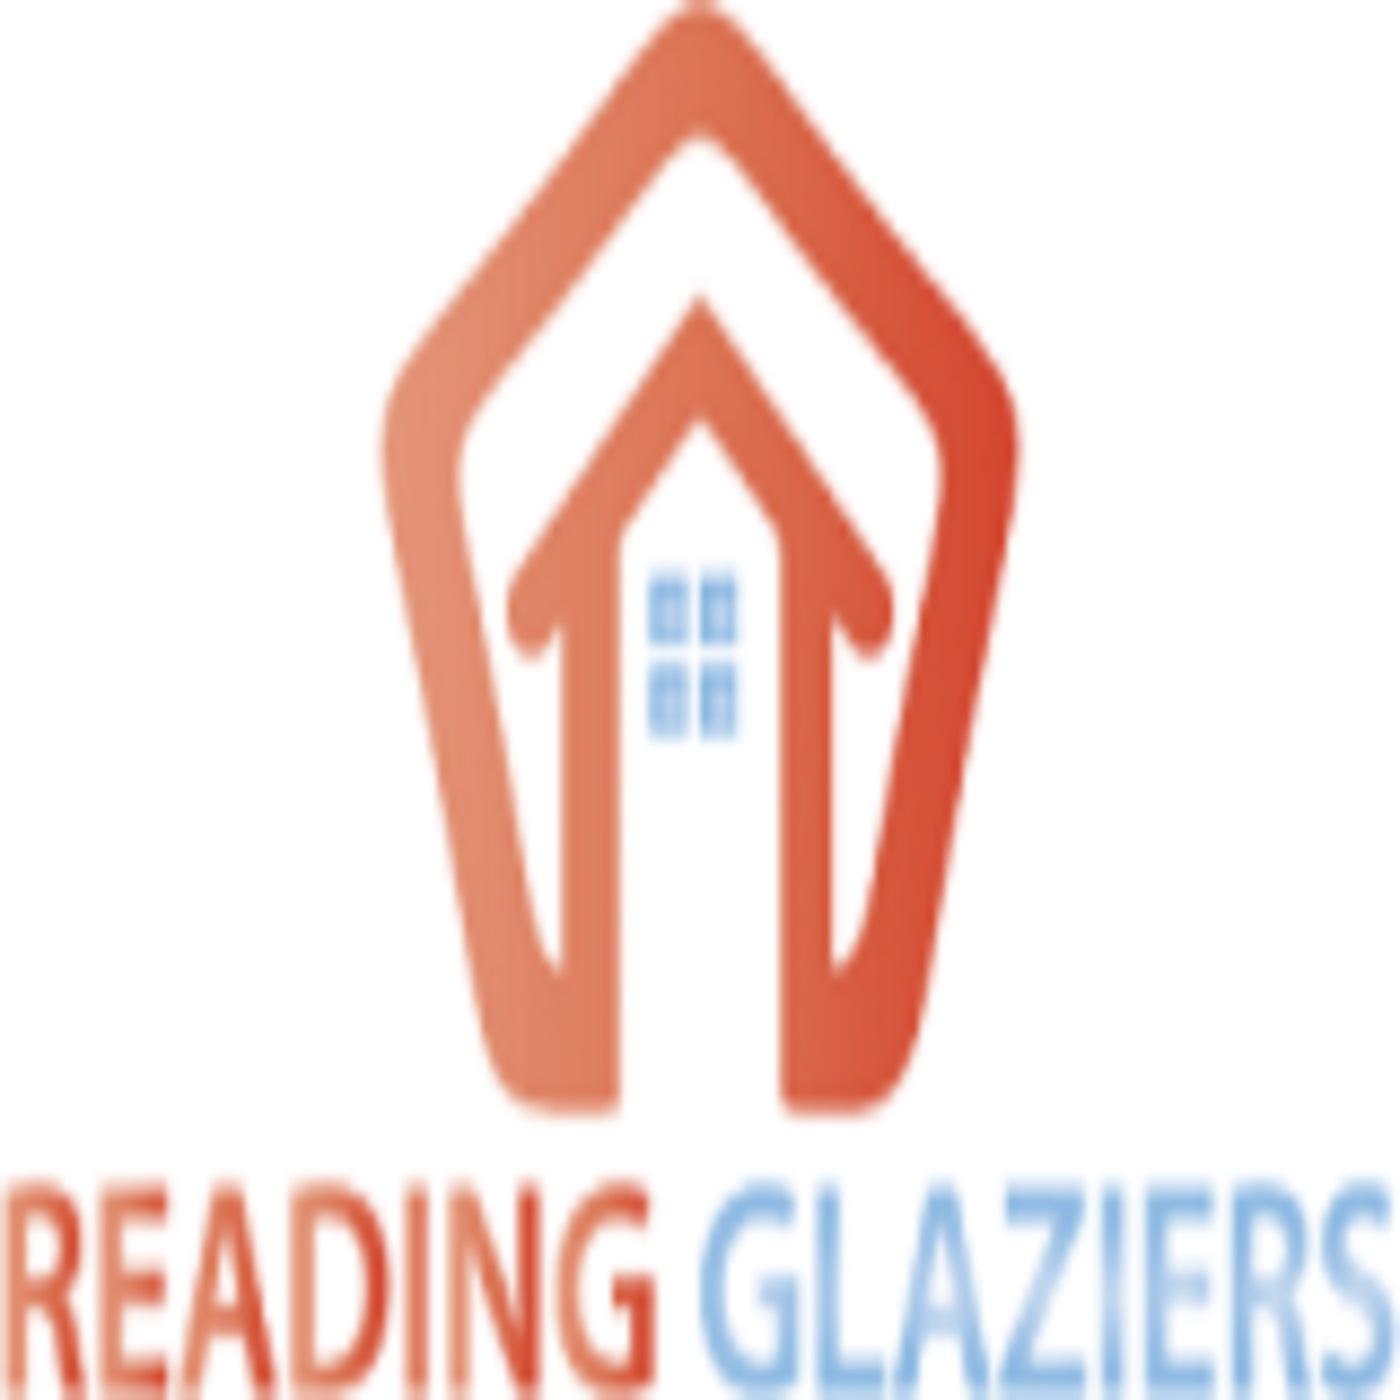 Reading Glaziers - Double Glazing Window Repairs